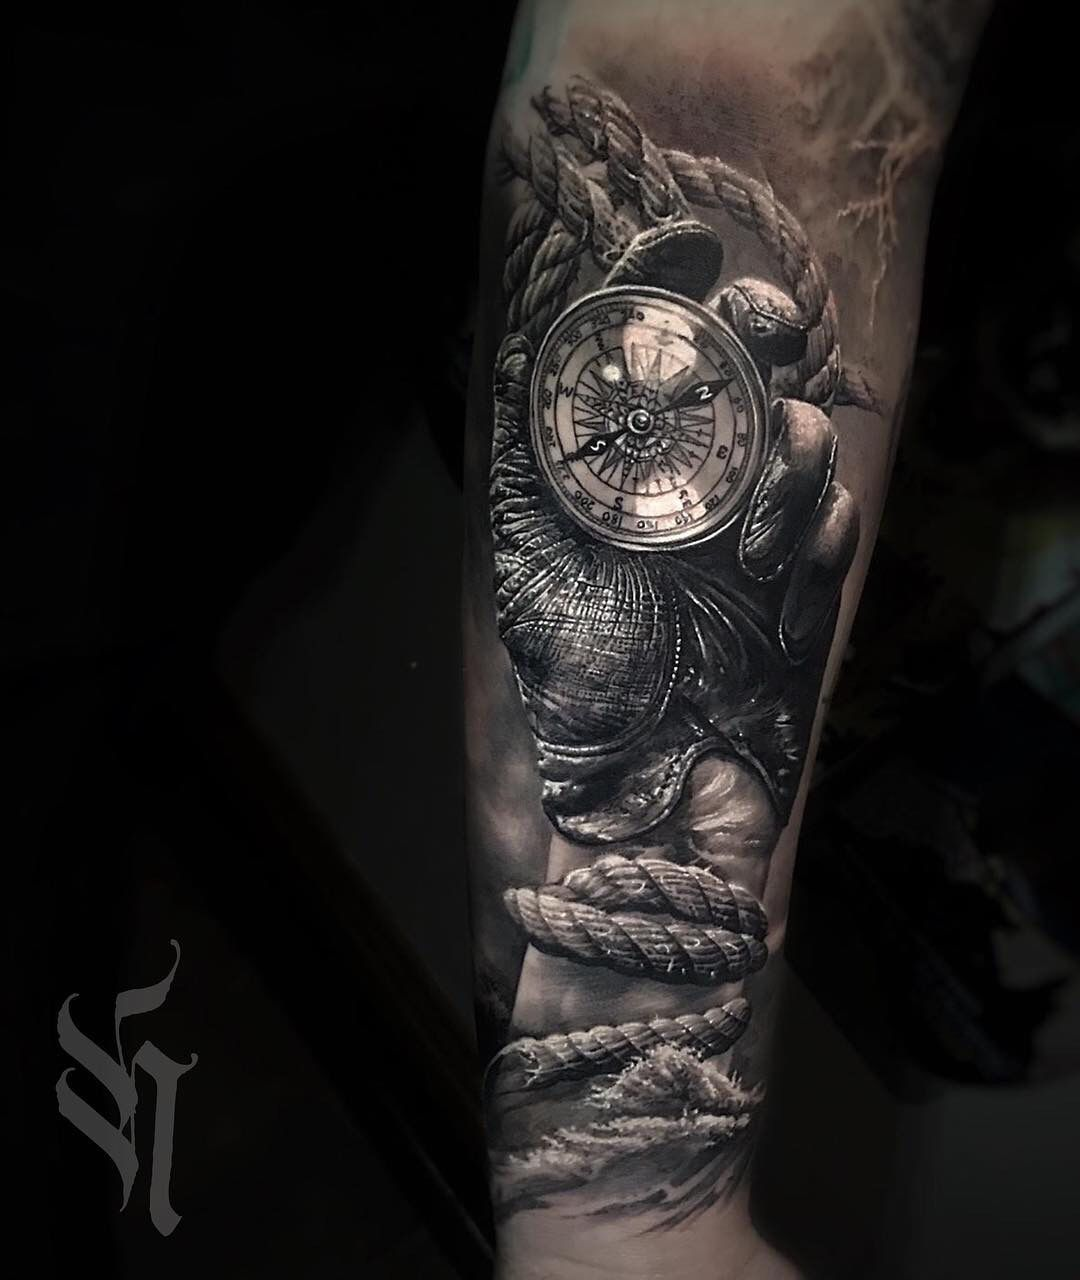 Glove Compass Tattoos Sleeve Tattoos Black White Tattoos